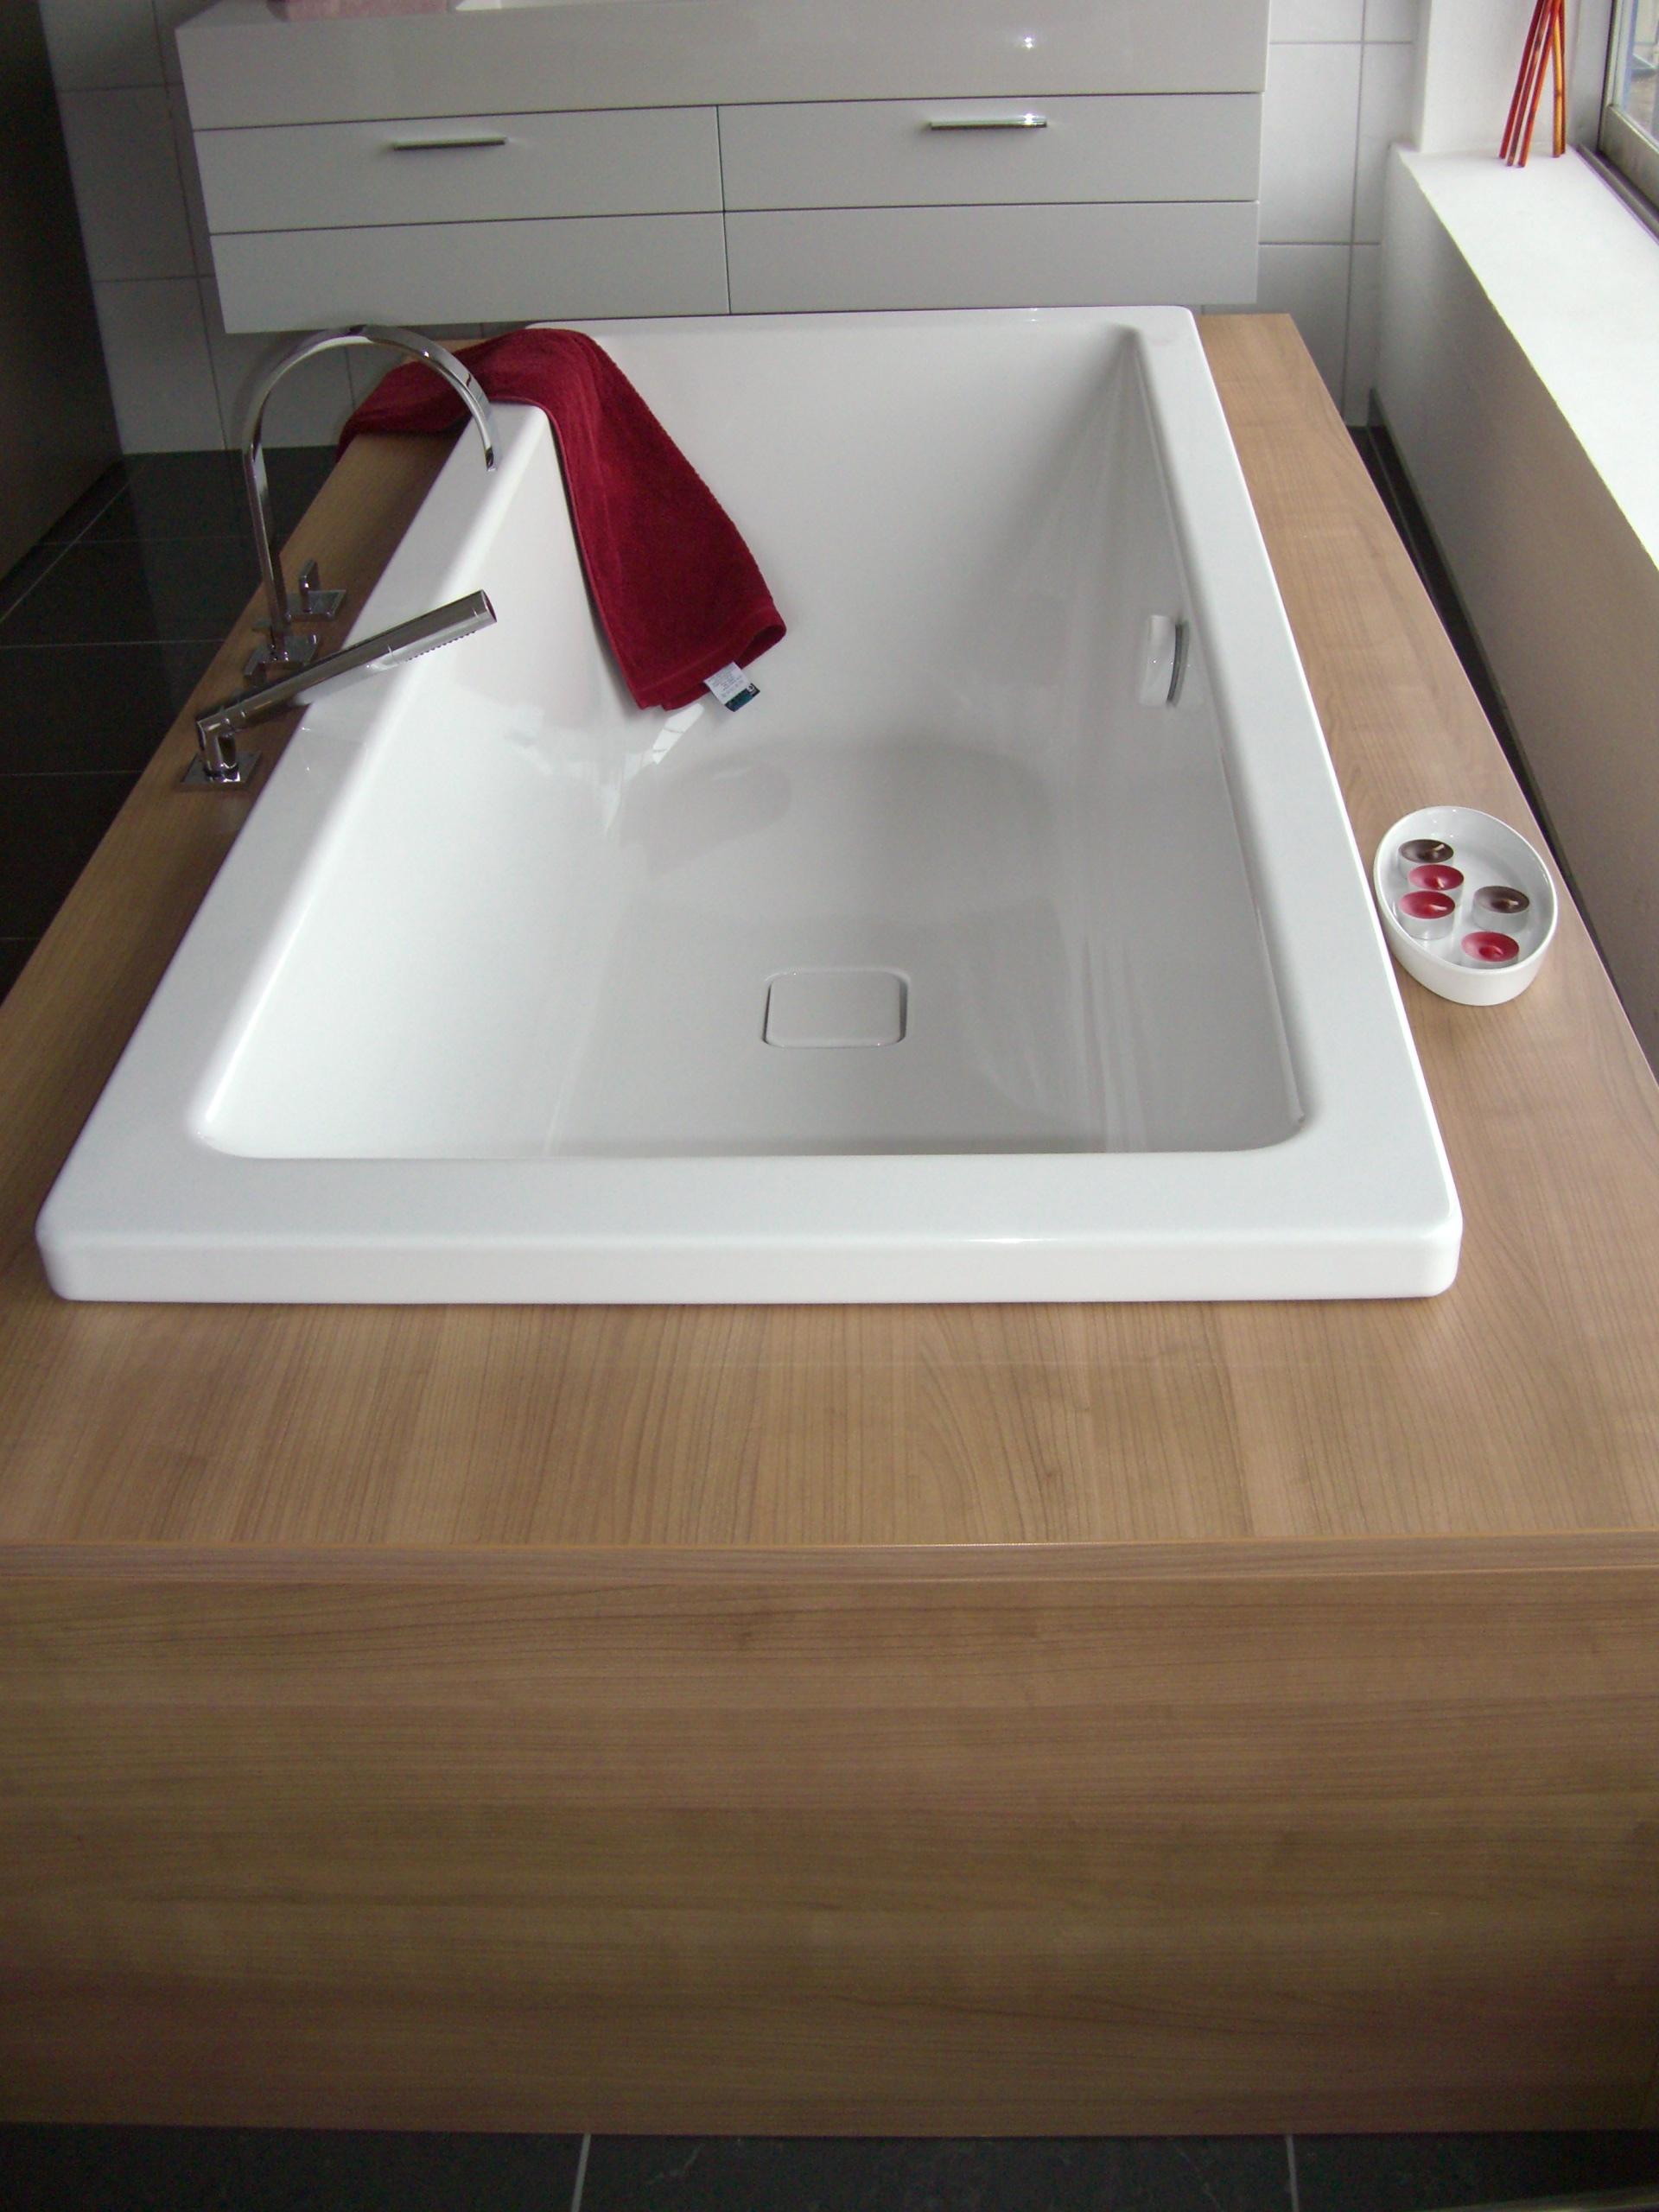 kaldewei conoduo badewanne 170x75cm wei modell 732. Black Bedroom Furniture Sets. Home Design Ideas